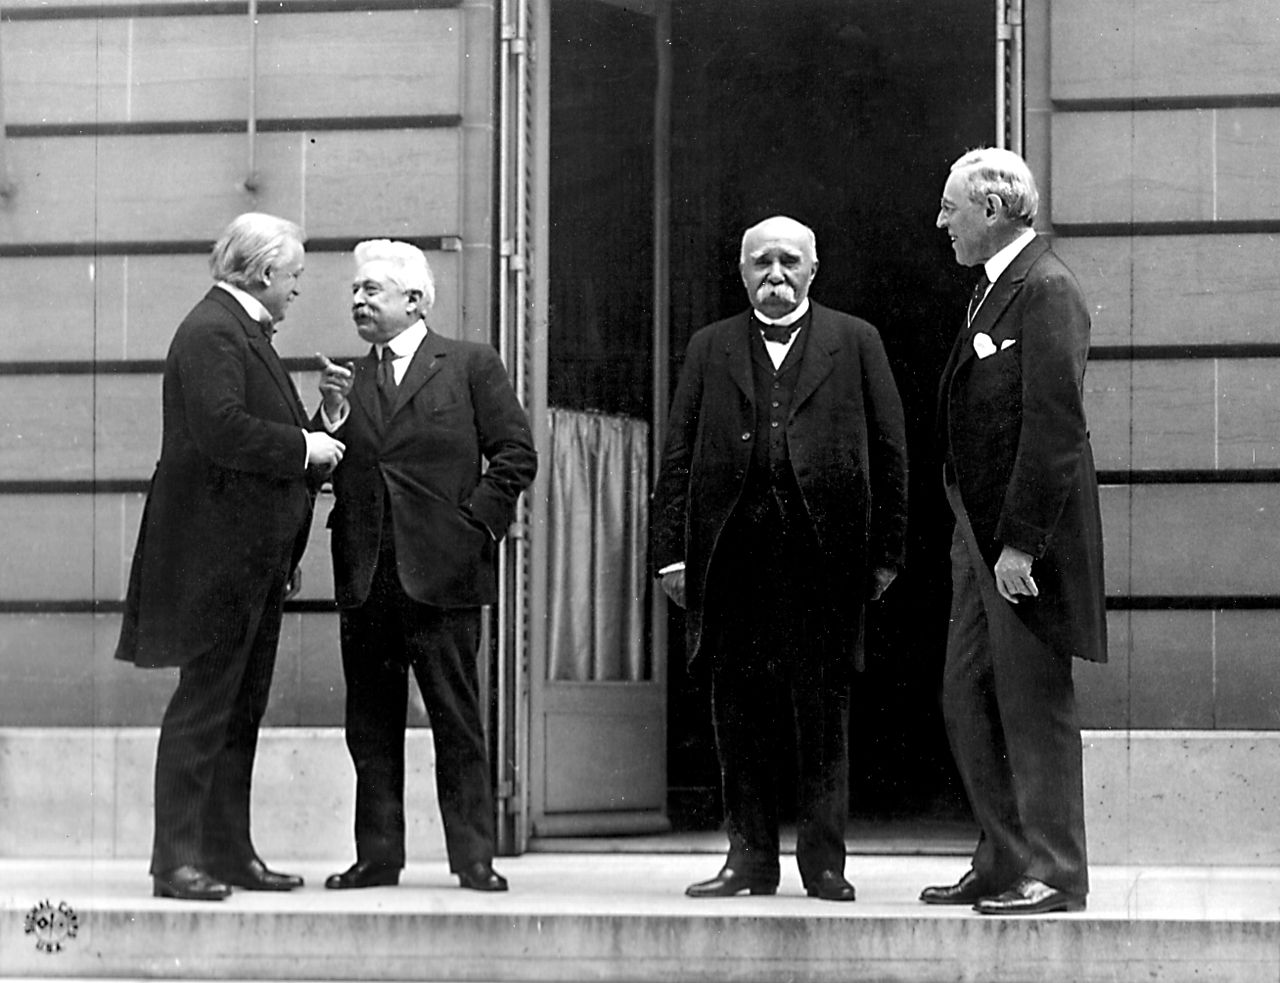 Big four Το Συμβούλιο των Τεσσάρων στη σύνοδο ειρήνης Λόιντ Τζορτζ Βιττόριο Ορλάντο Ζωρζ Κλεμανσώ Γούντροου Ουίλσον